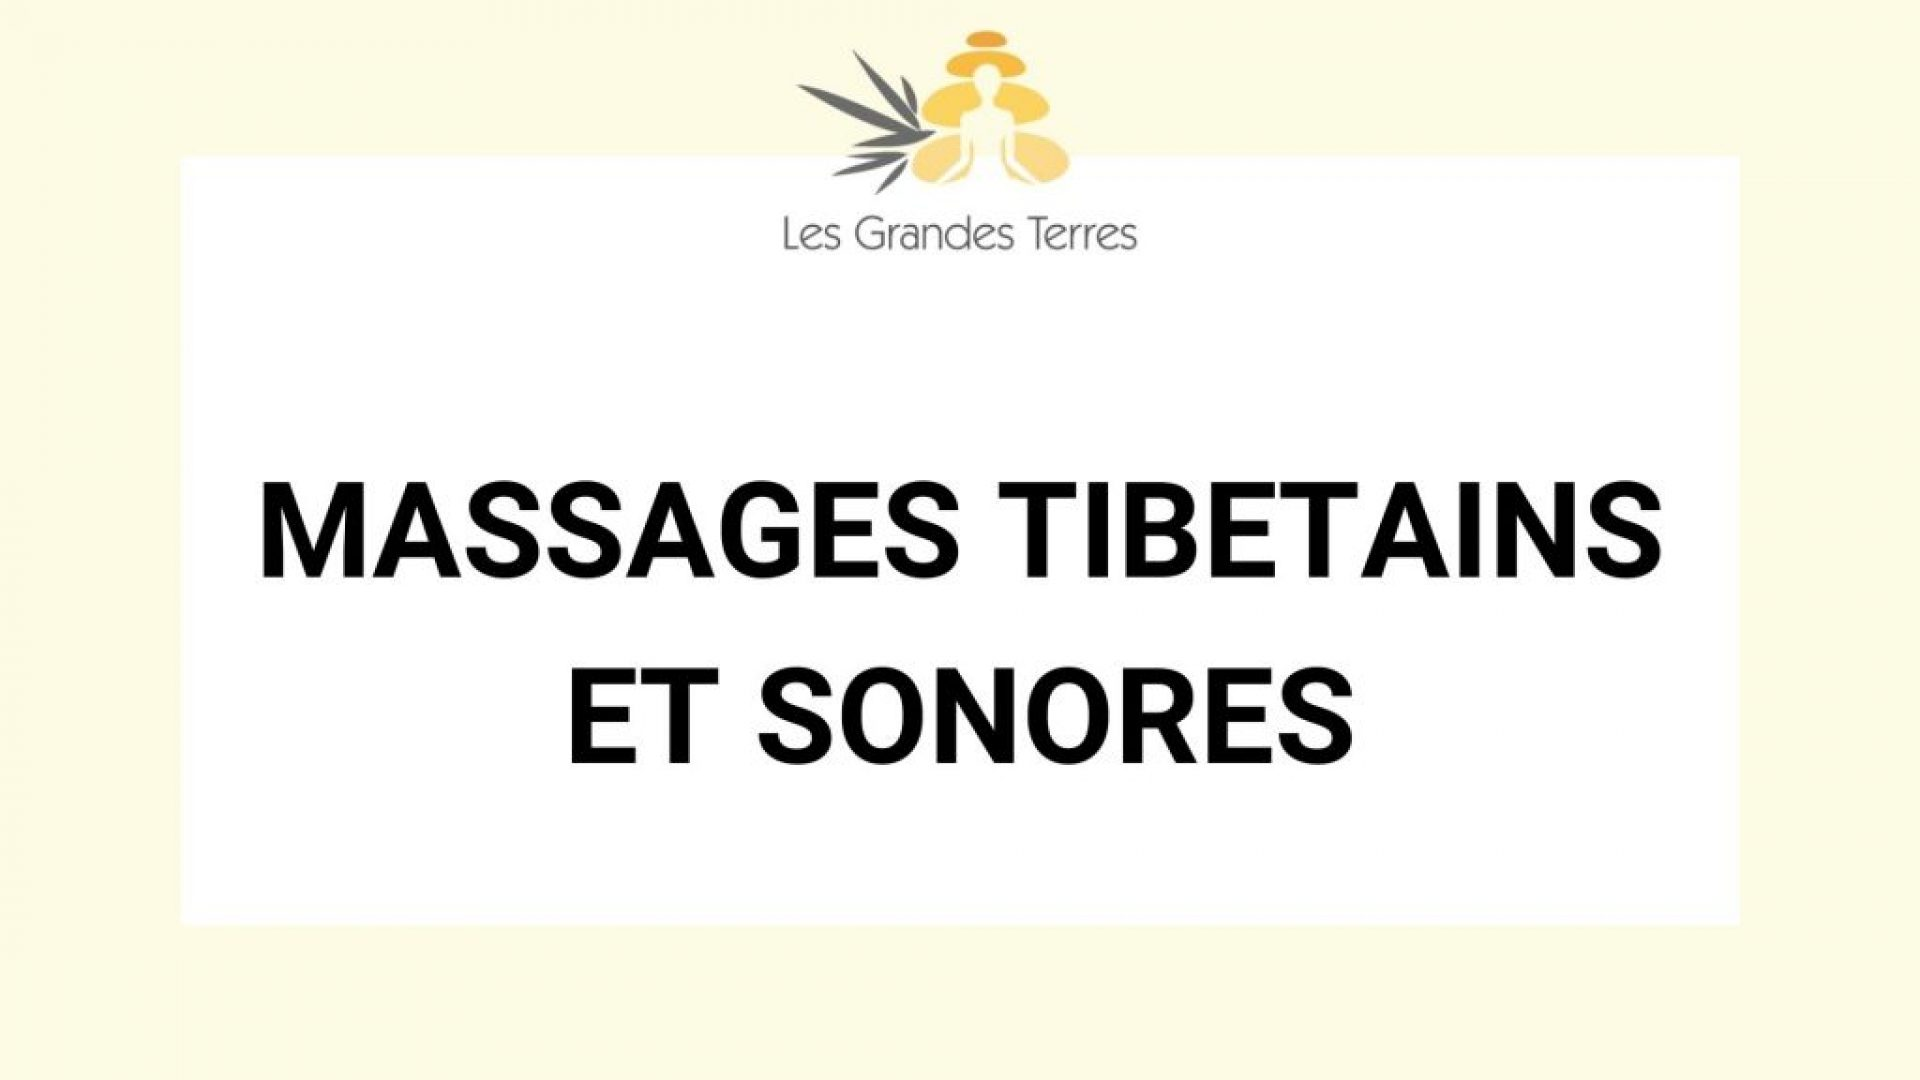 MASSAGES TIBETAINS ET SONORES